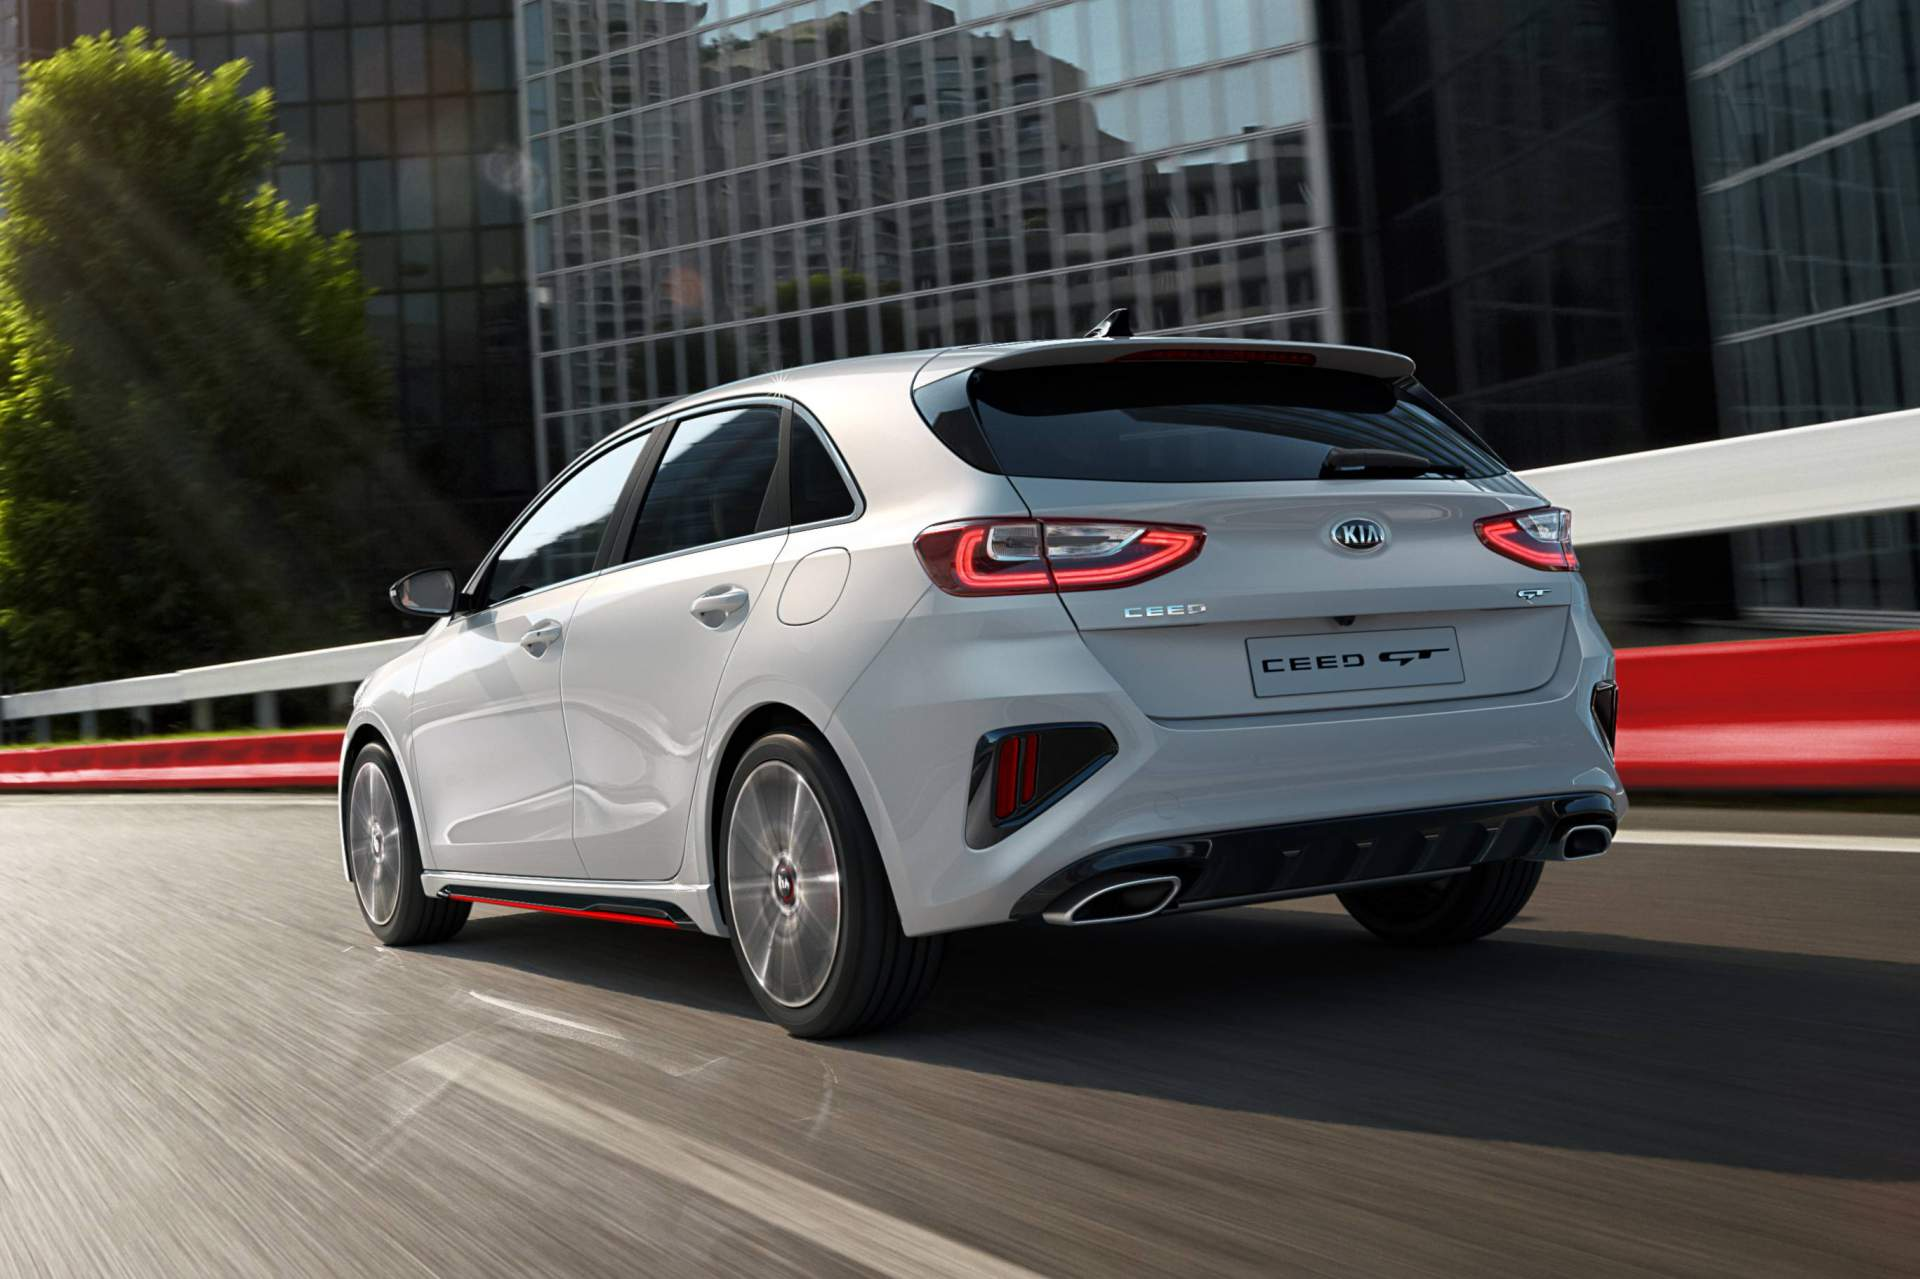 2020 Kia Forte GT Challenges the Volkswagen Jetta GLI - autoevolution